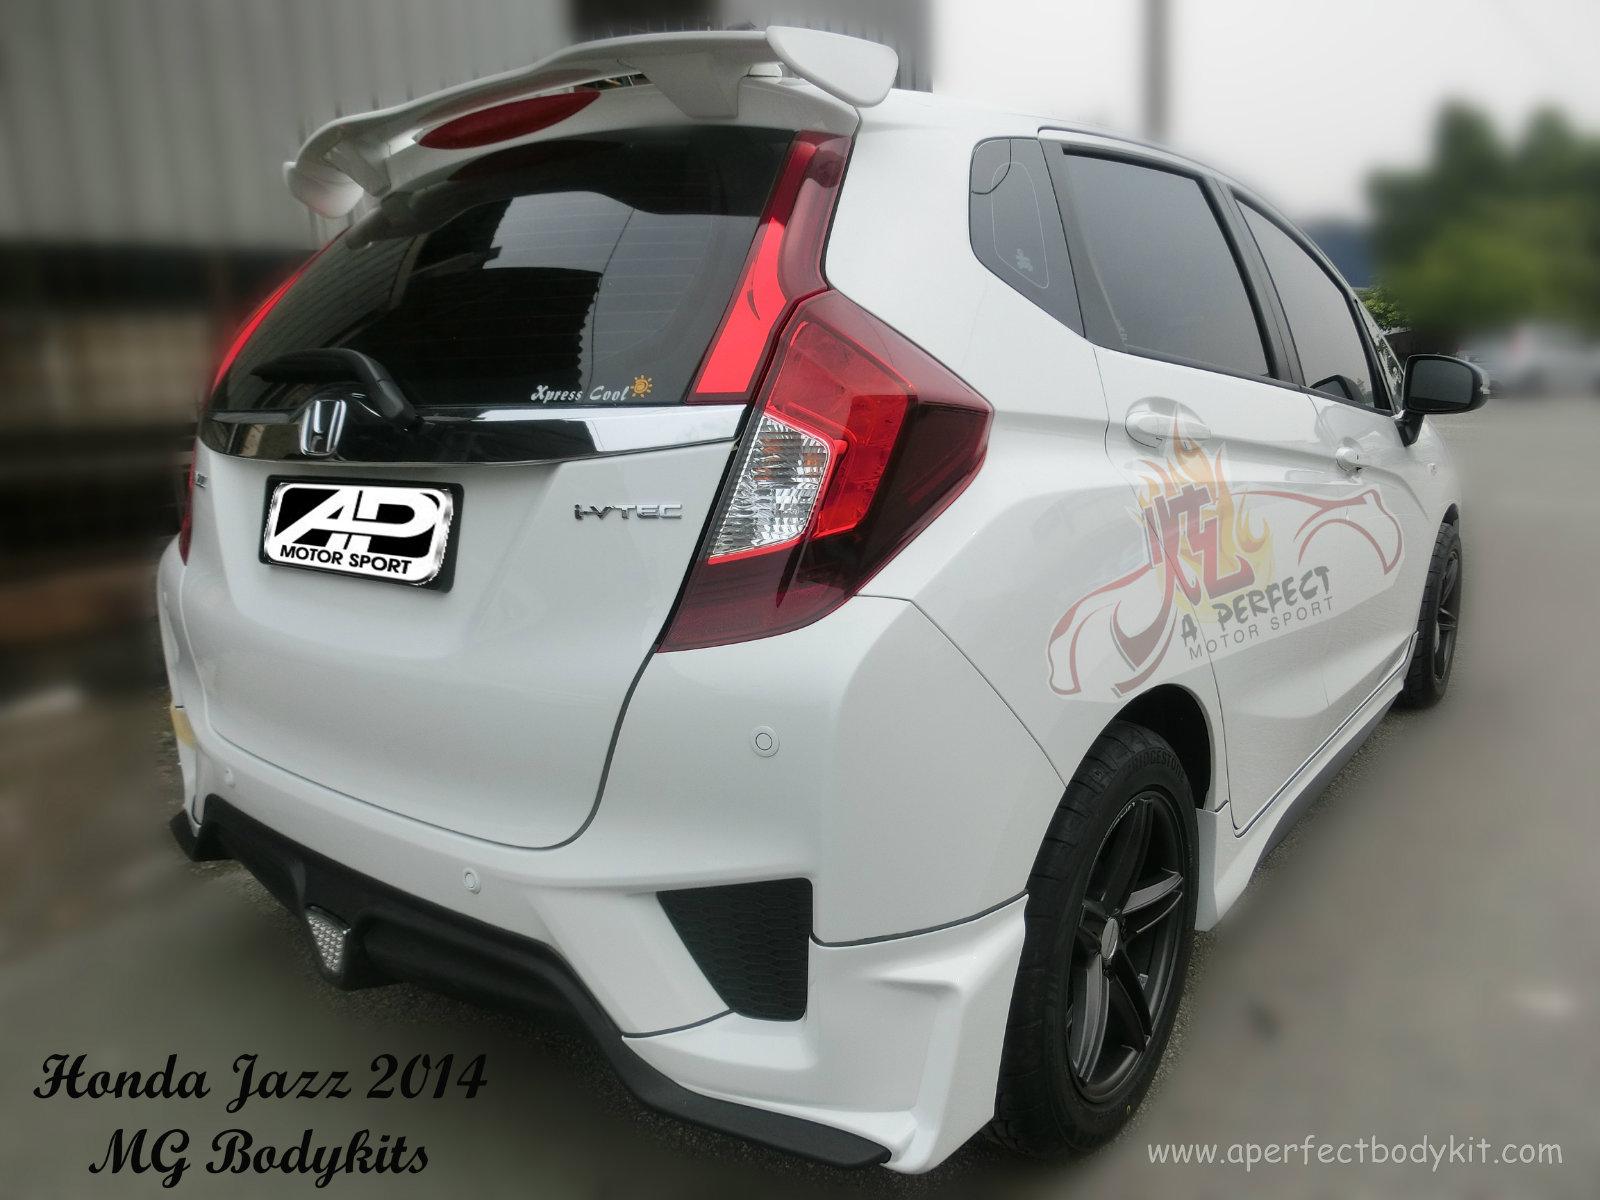 Honda Jazz 2014 MG Bodykits ☆ Honda Jazz 2014 JB Johor